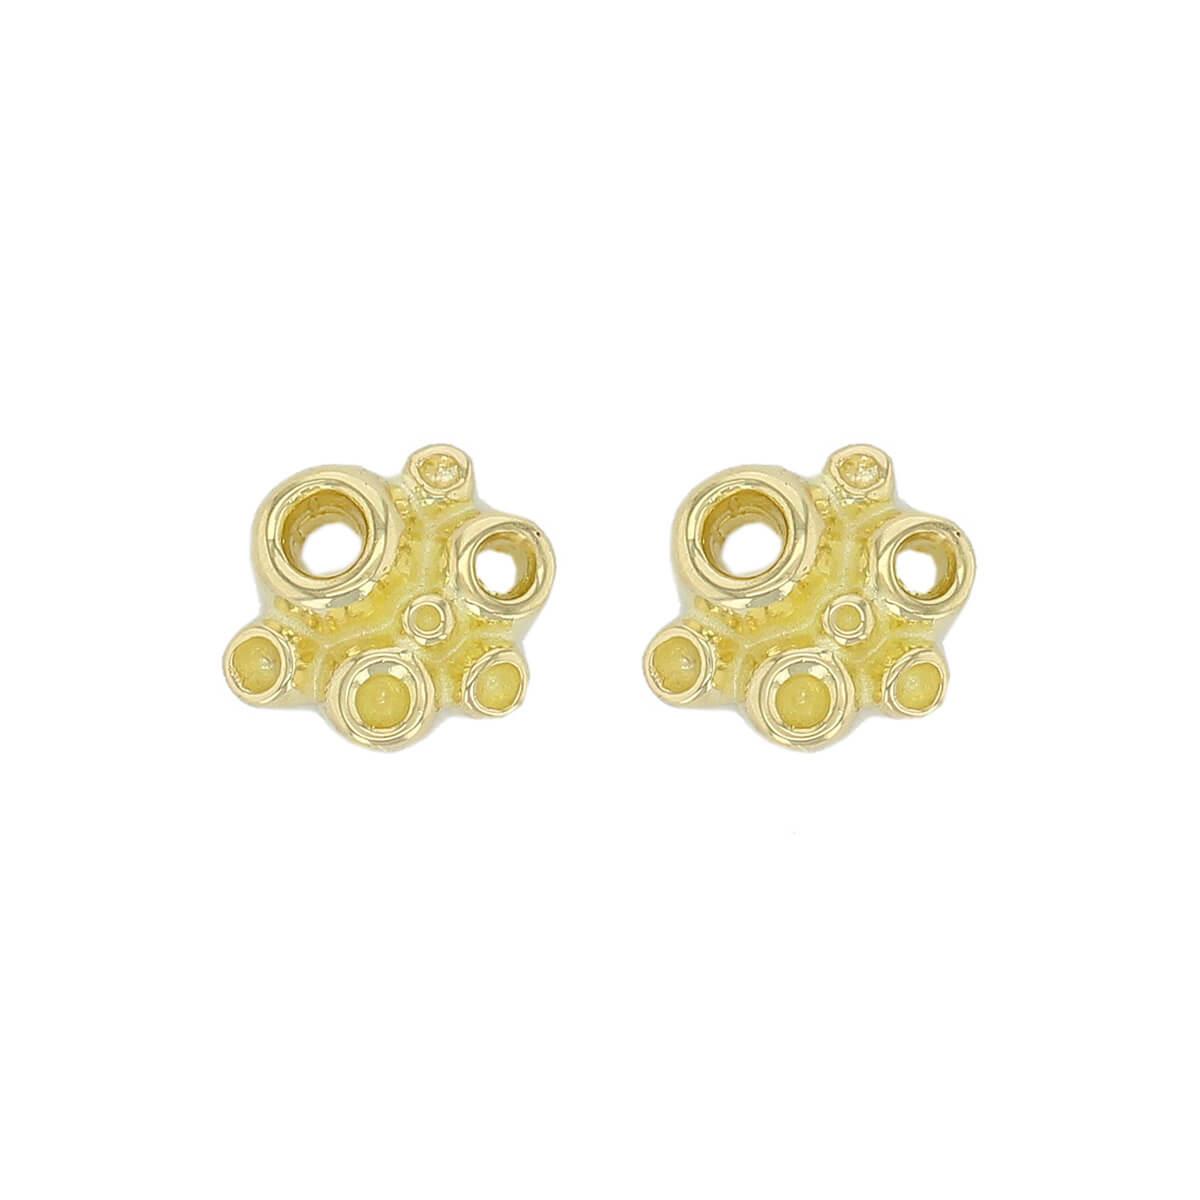 Faller Fizz 18ct yellow gold stud earrings, designer jewellery, jewelry, handcafted